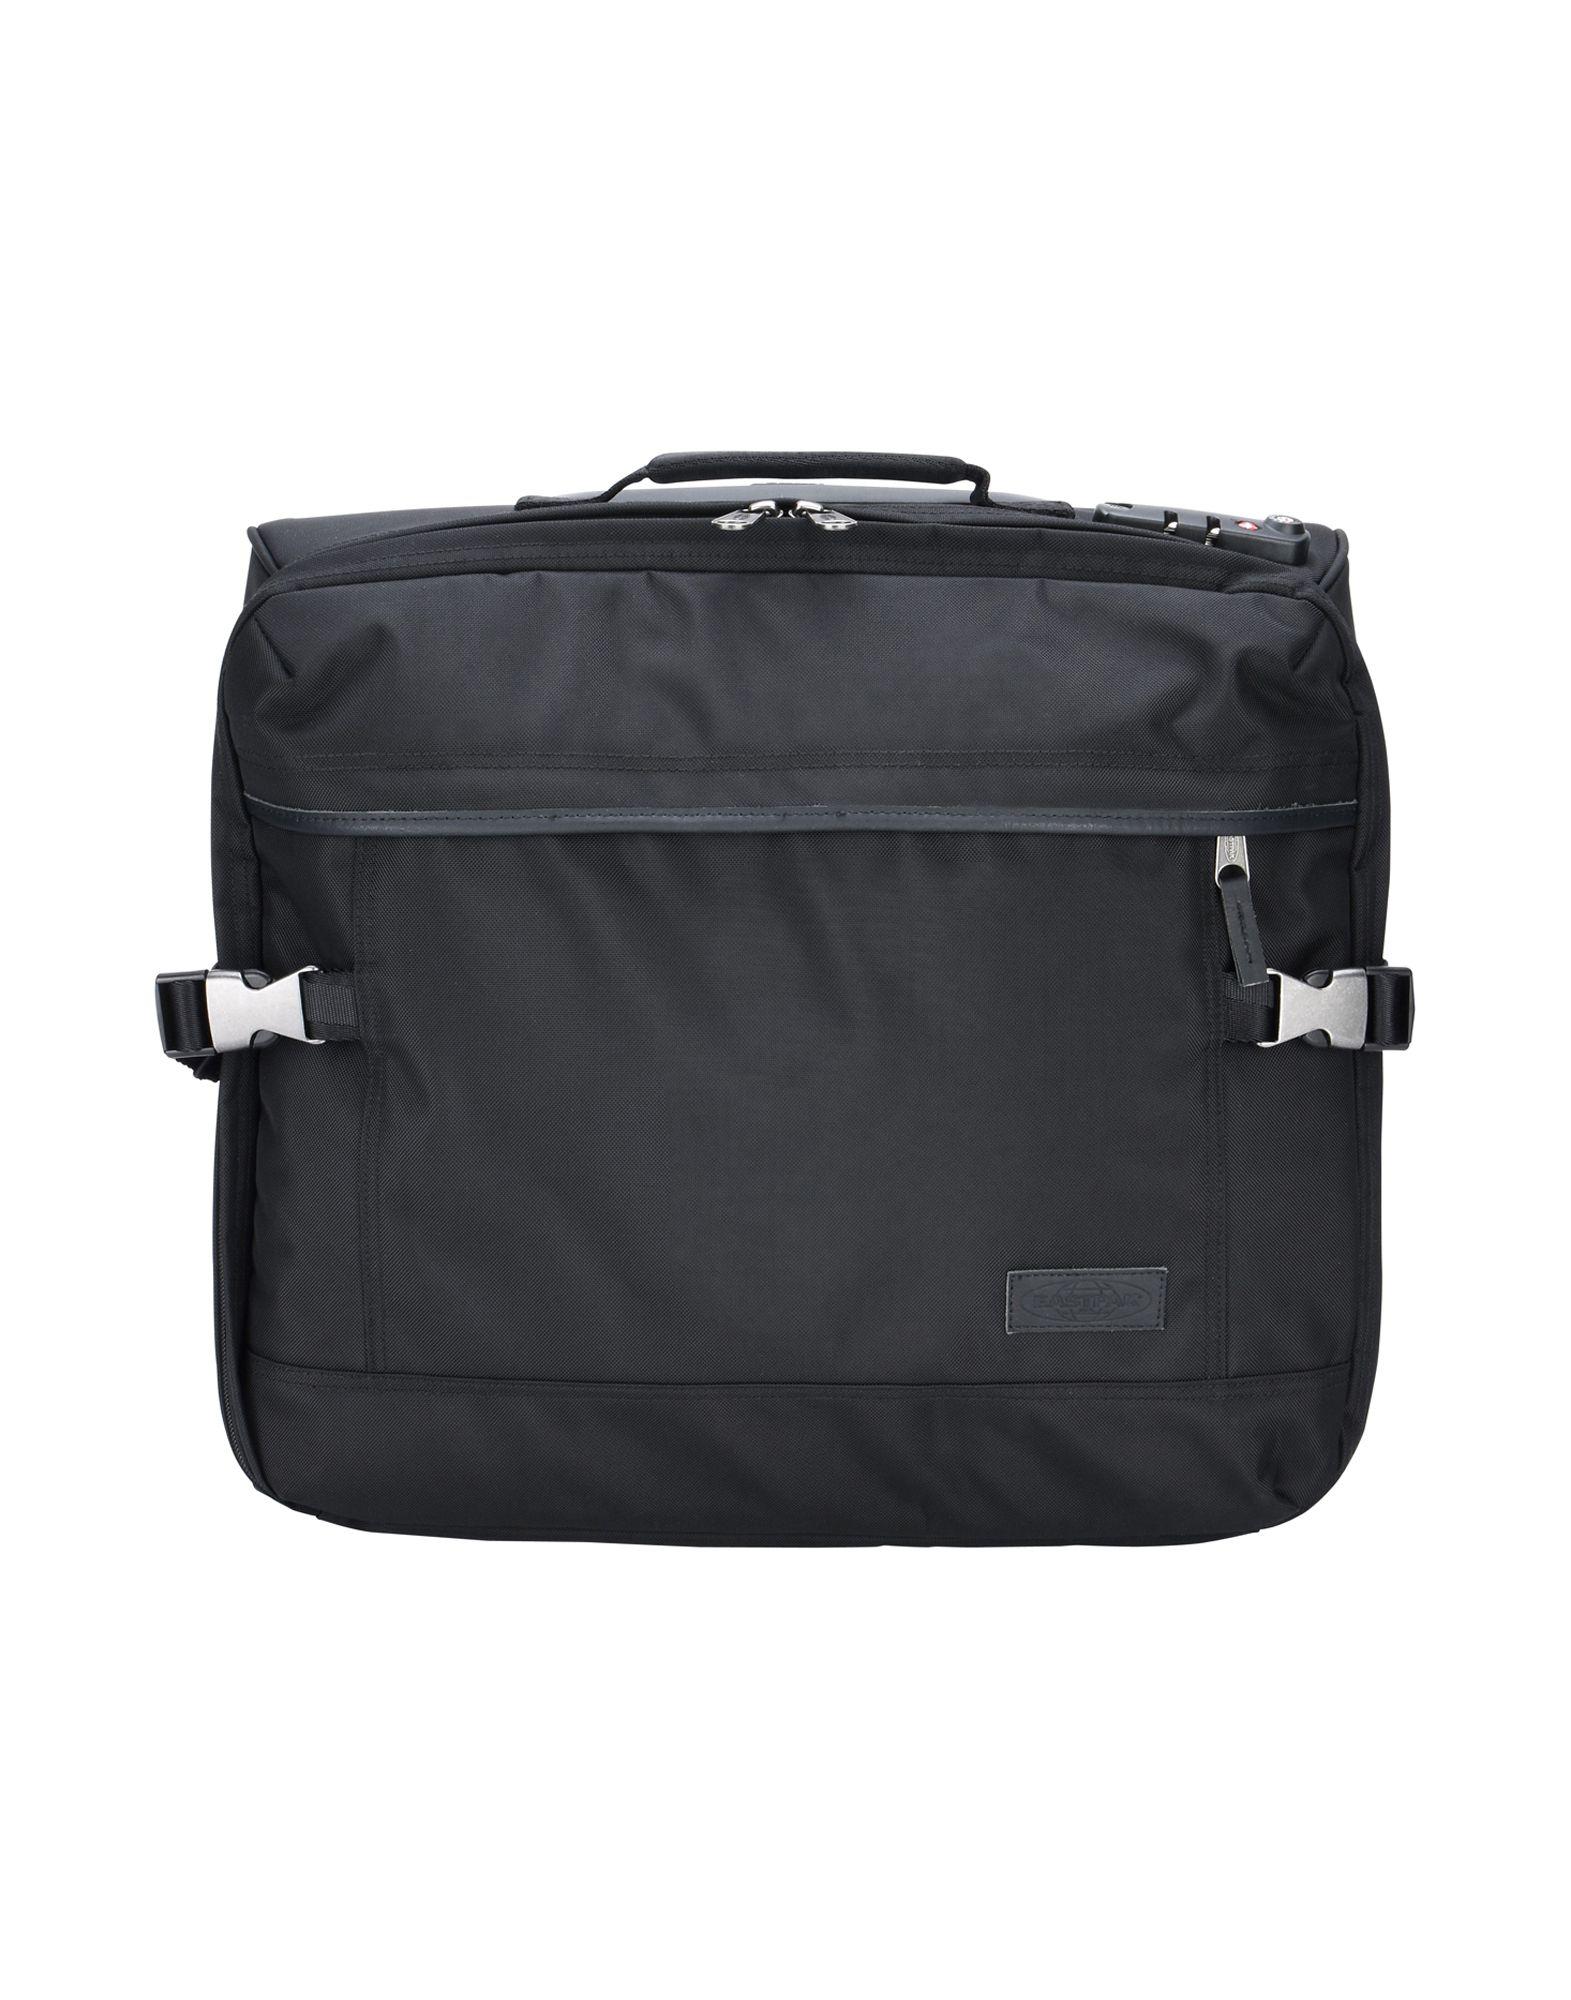 EASTPAK Чемодан/сумка на колесиках сумка eastpak ek04592d 2015 045